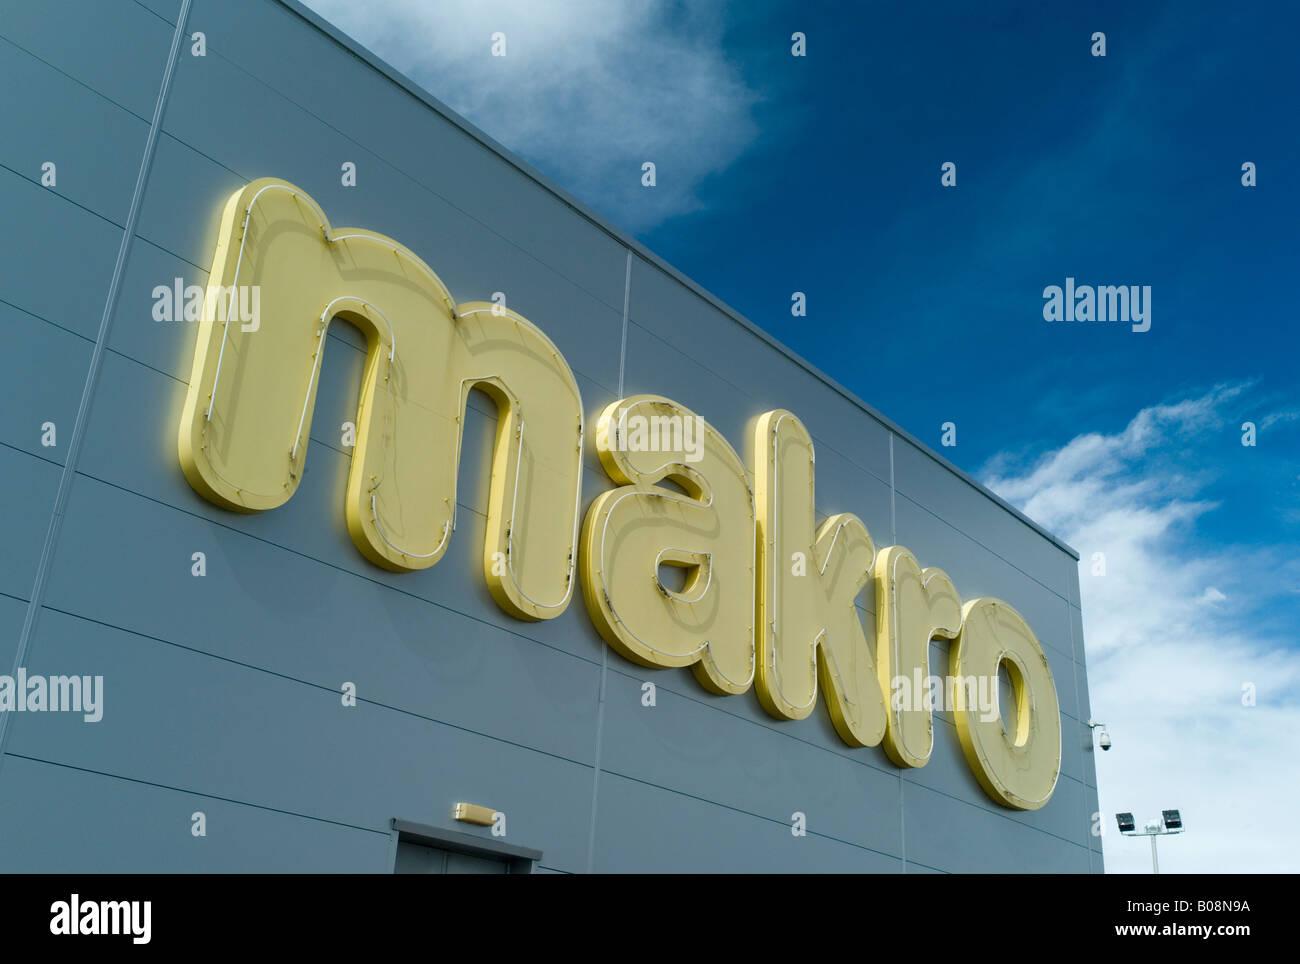 Makro store - Stock Image